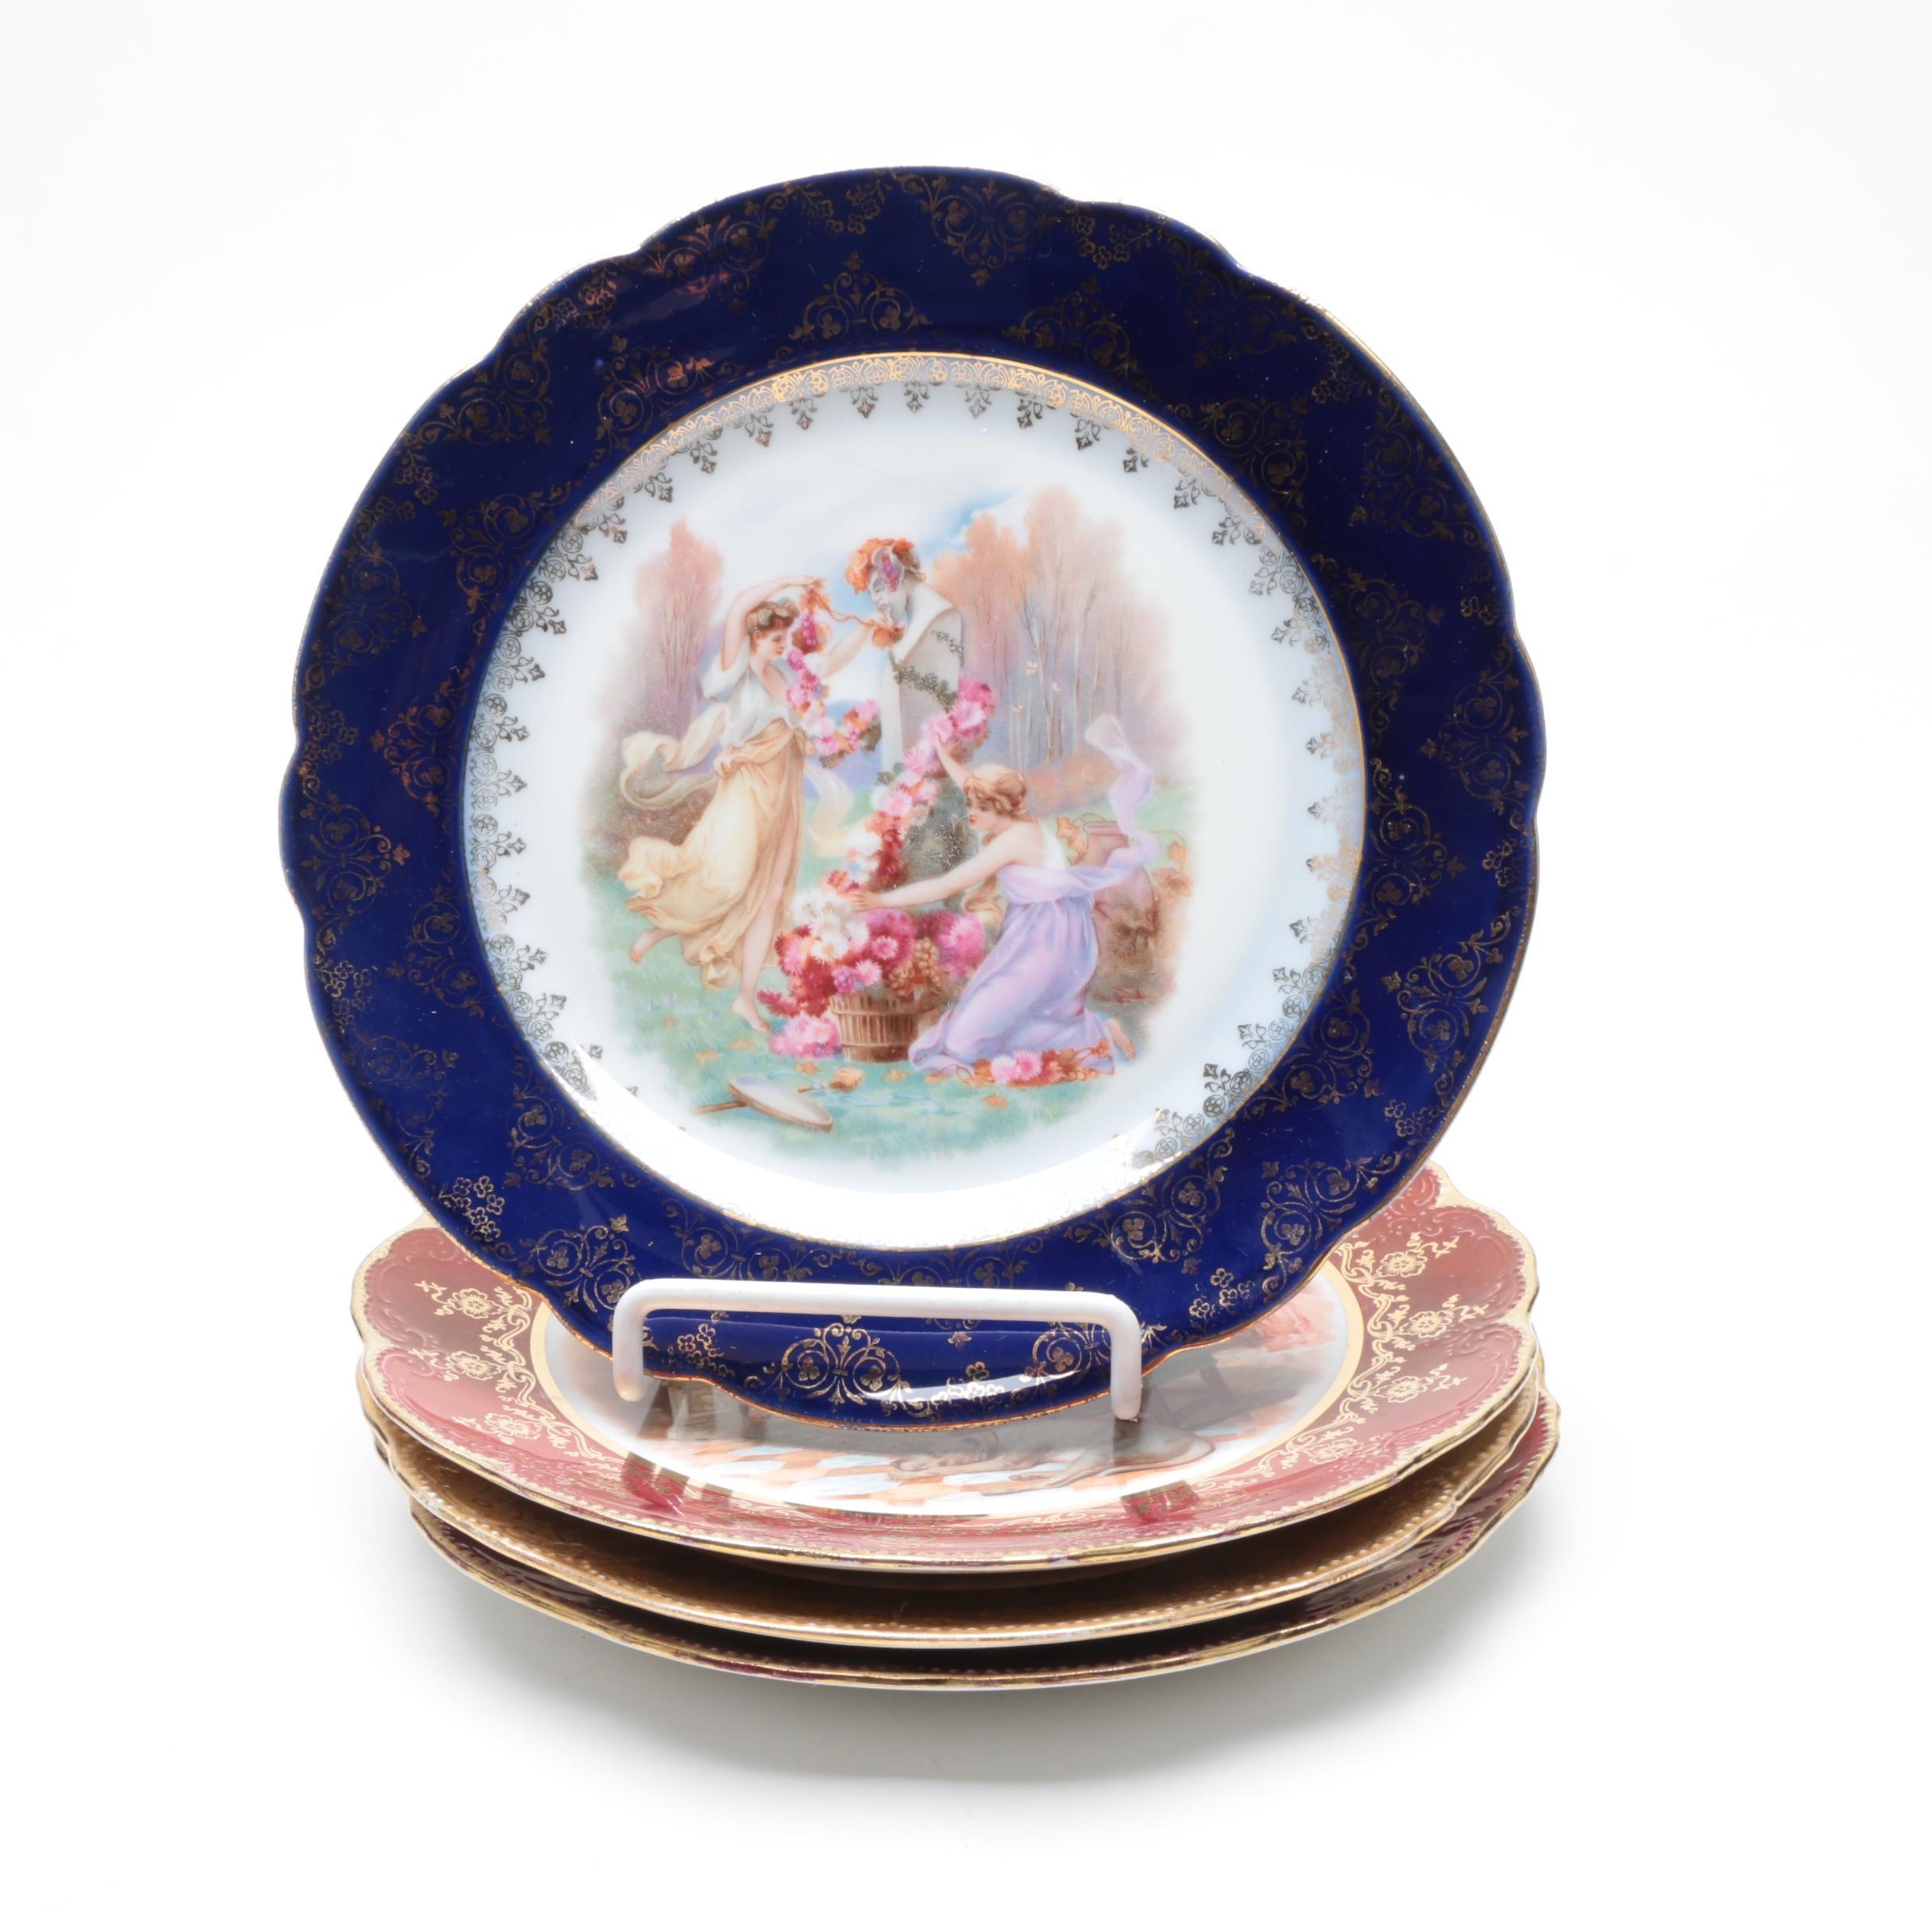 Antique Knights Templar Semi-Vitreous Porcelain Plates